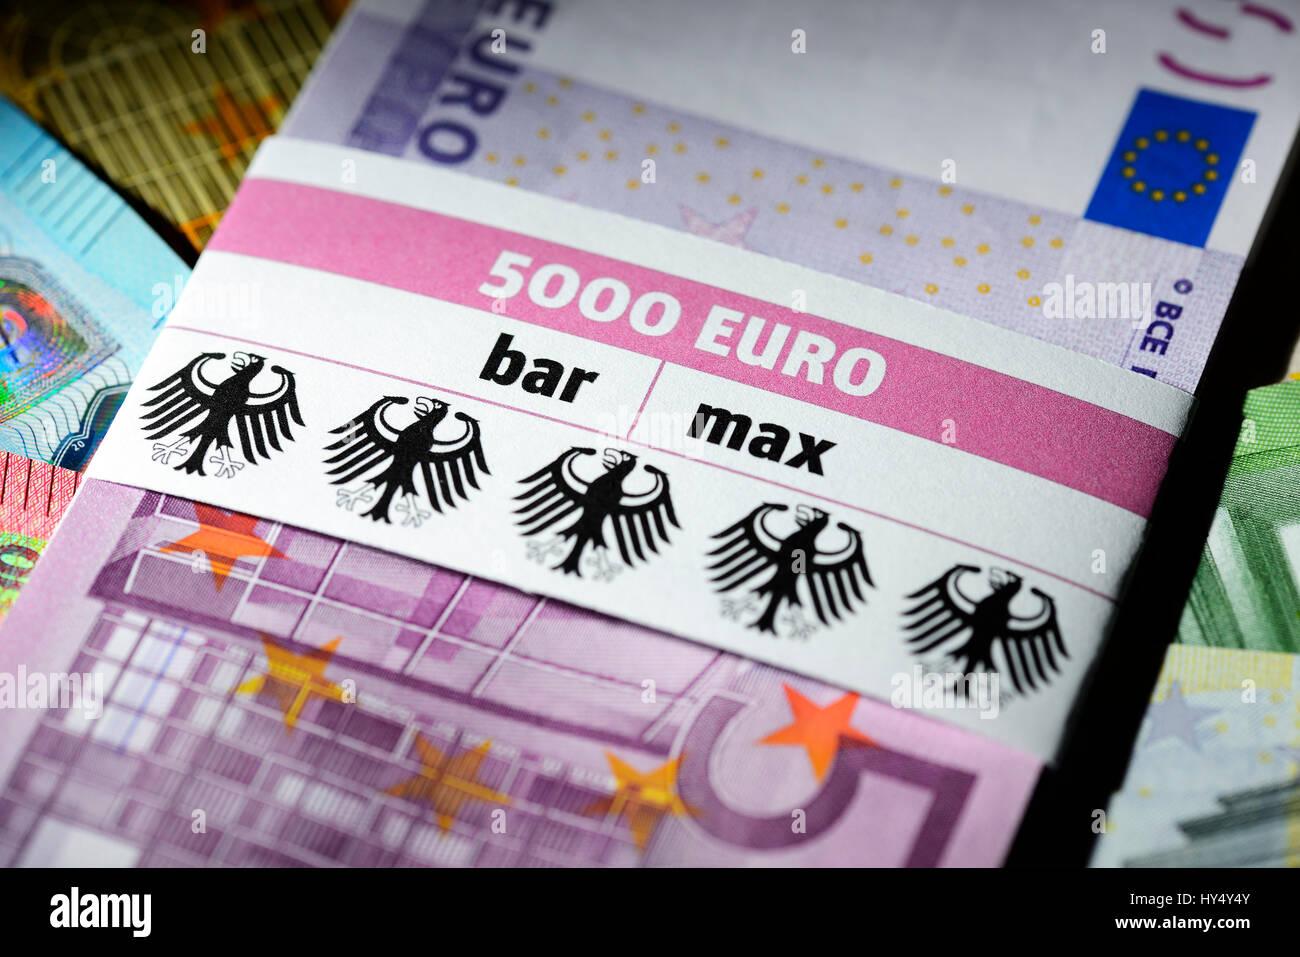 Kreditkarte Mit 5000 Euro Limit